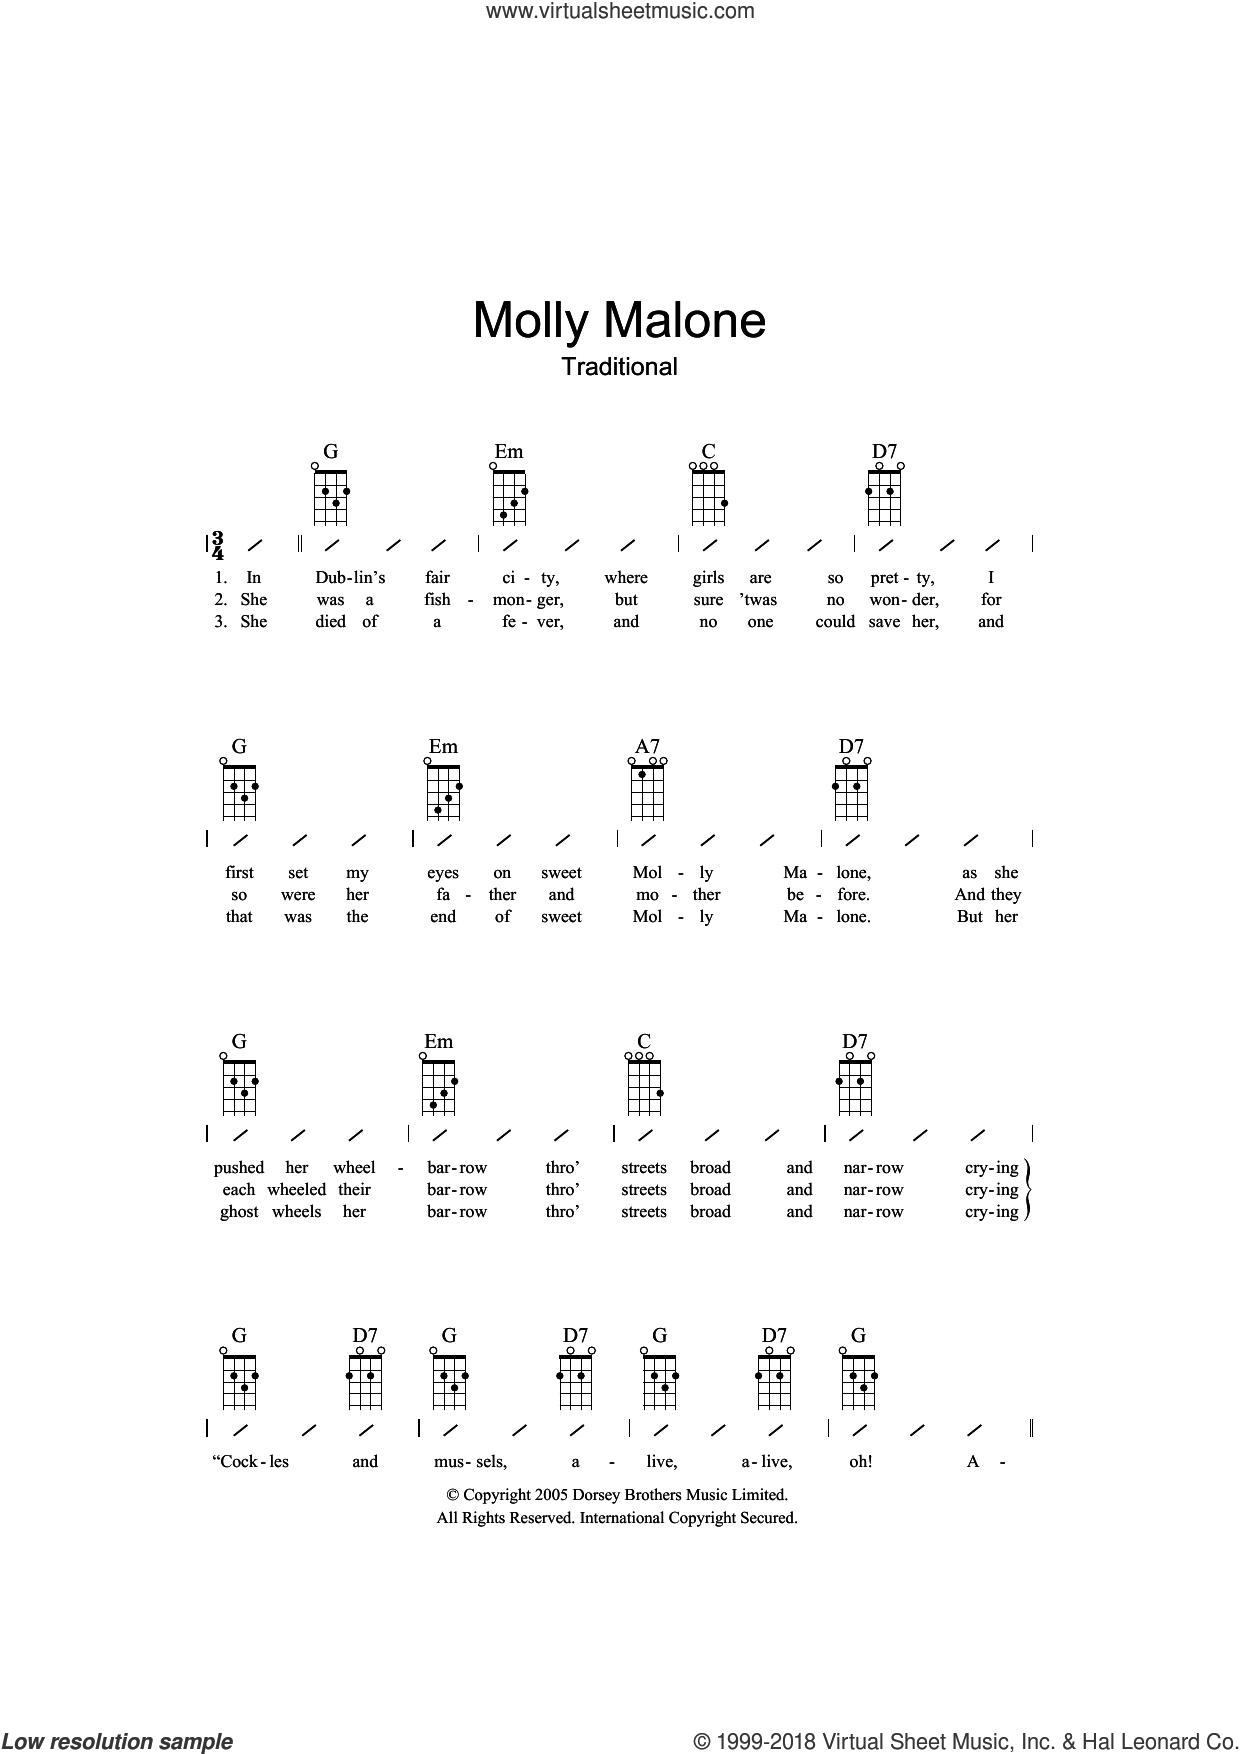 Molly Malone sheet music for ukulele (chords), intermediate skill level